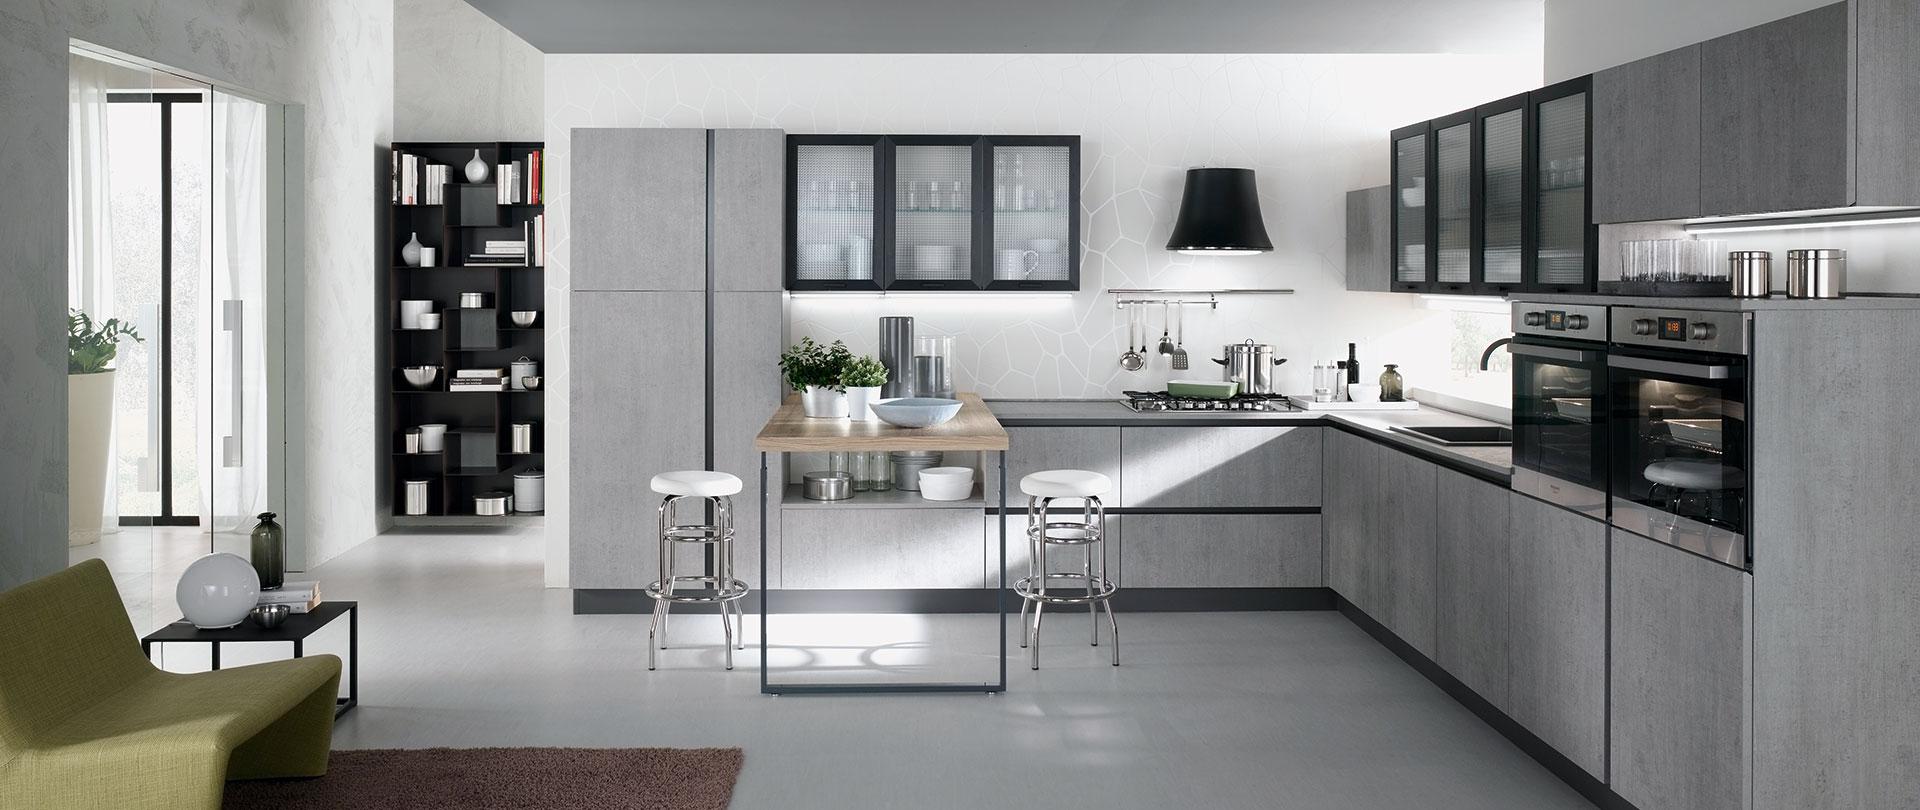 Cucina agor evo cucine for Foto moderne